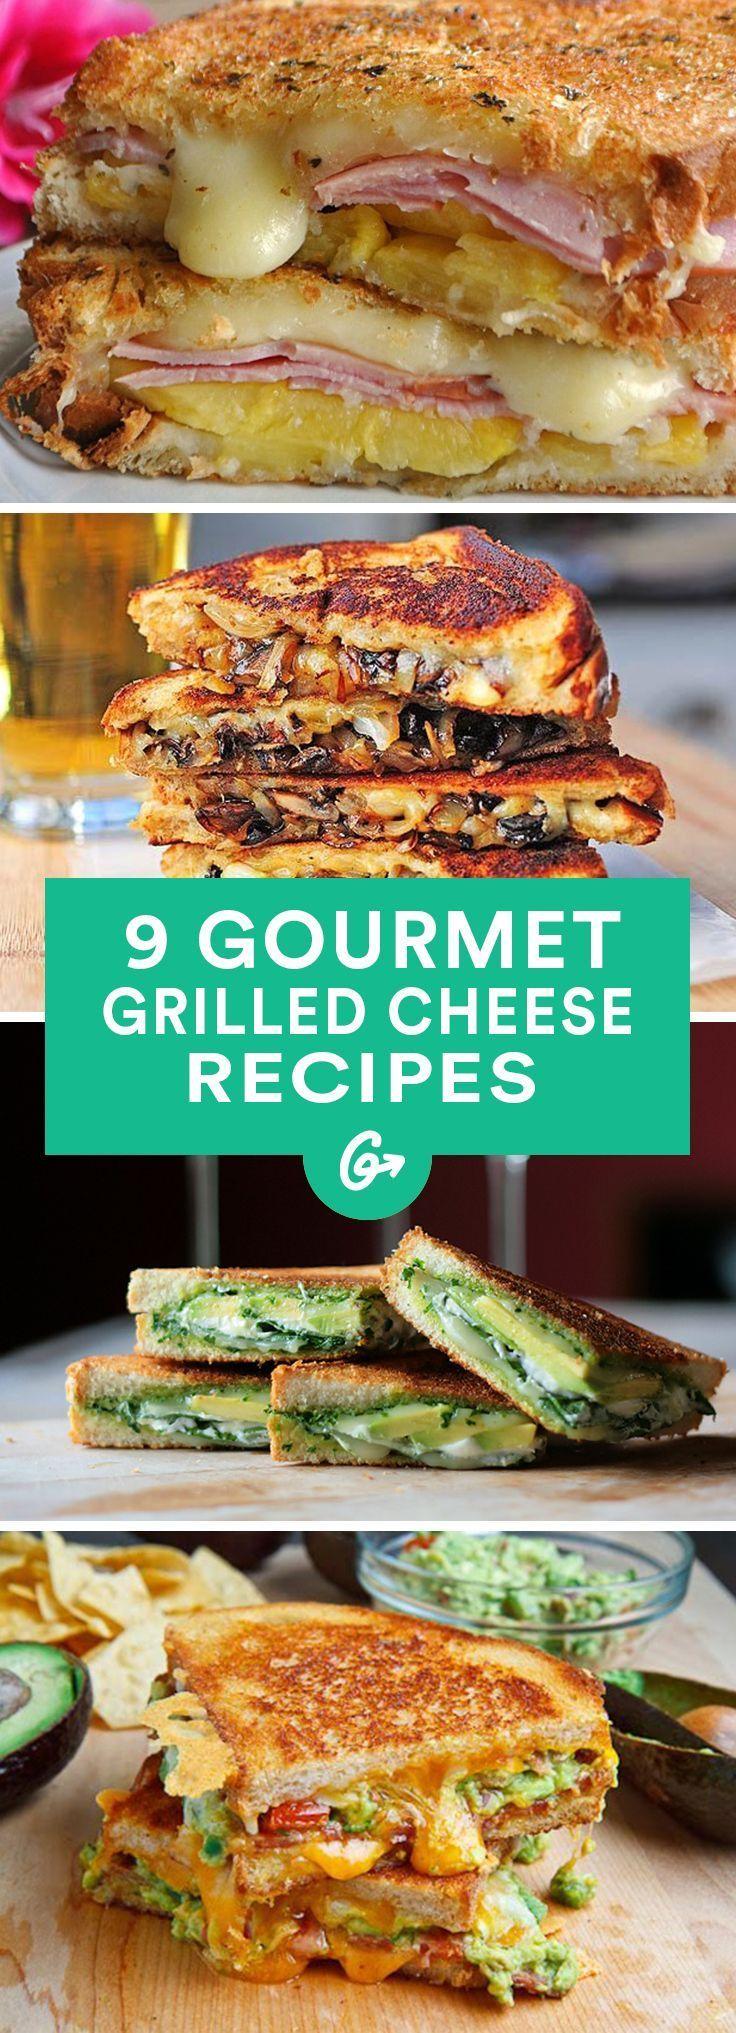 Best 25 gourmet grilled cheeses ideas on pinterest for Gourmet dinner menu ideas